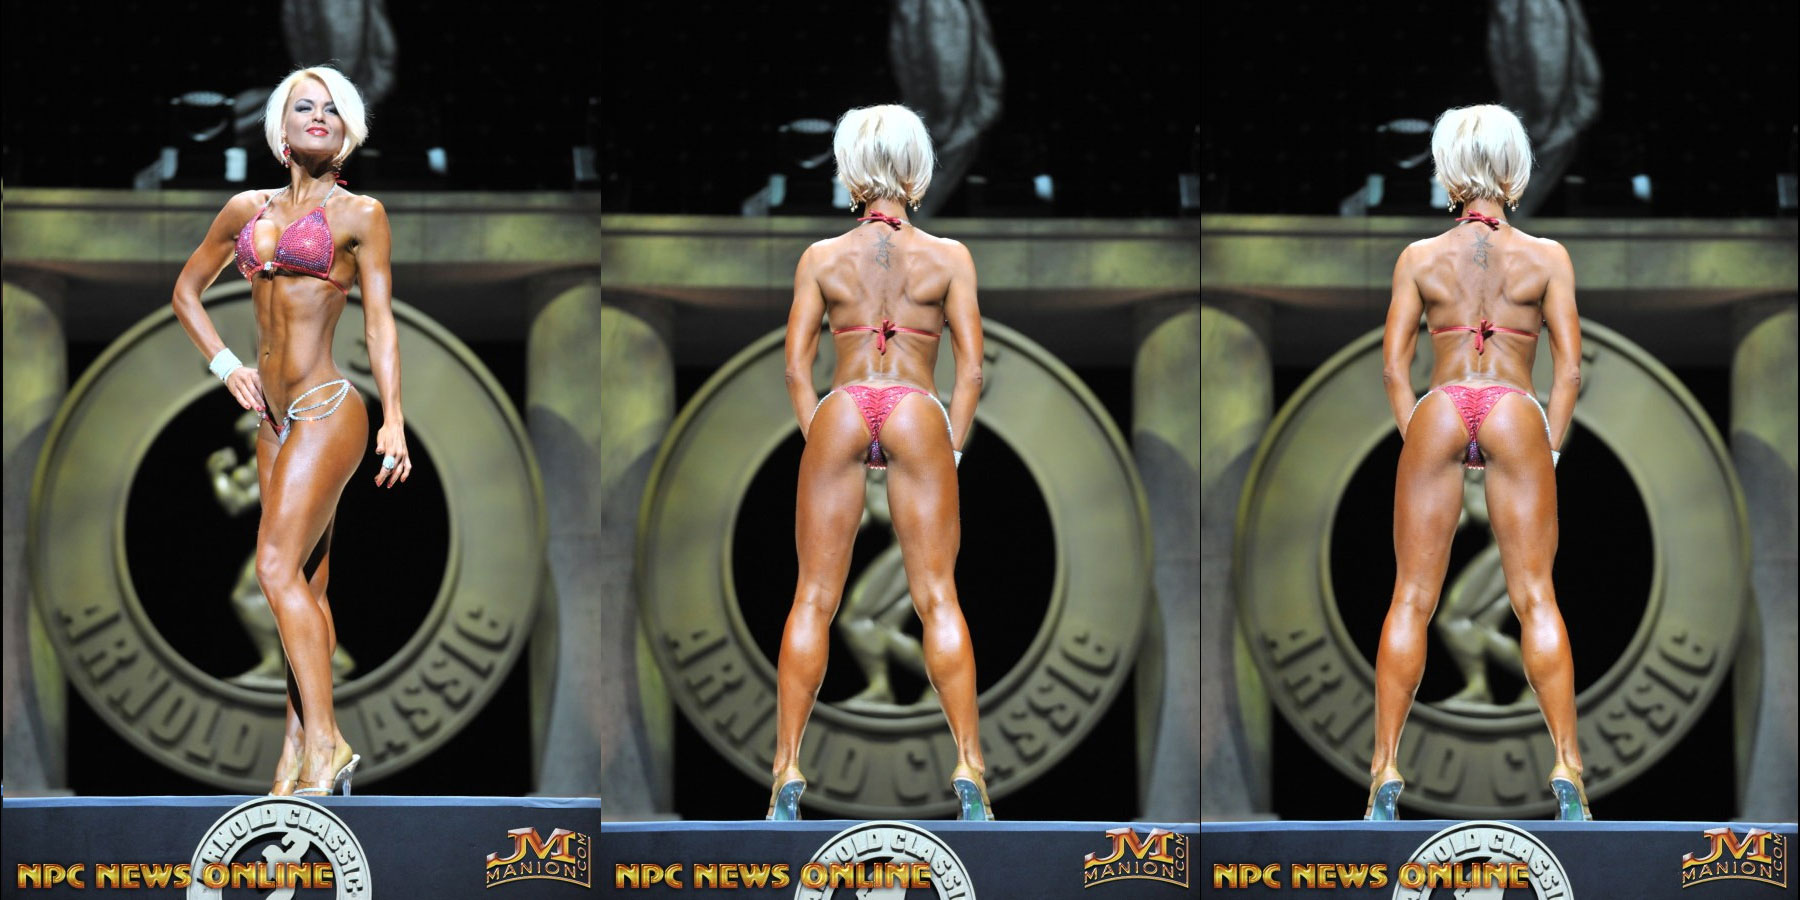 #11 Anna Starodubtseva